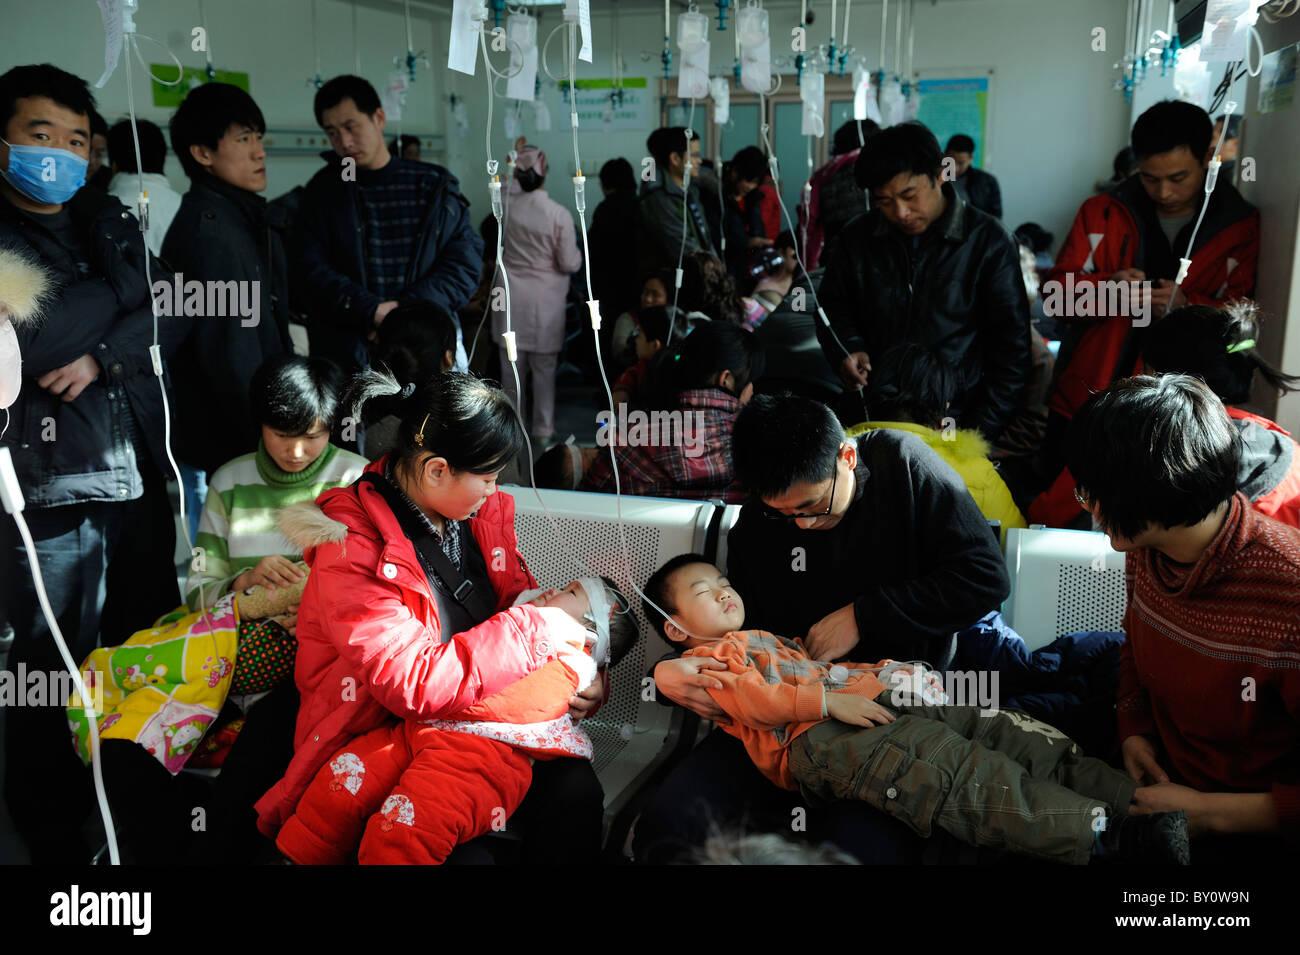 Chinese children receive transfusion at Children's Hospital in Beijing, China.12-Jan-2011 Stock Photo